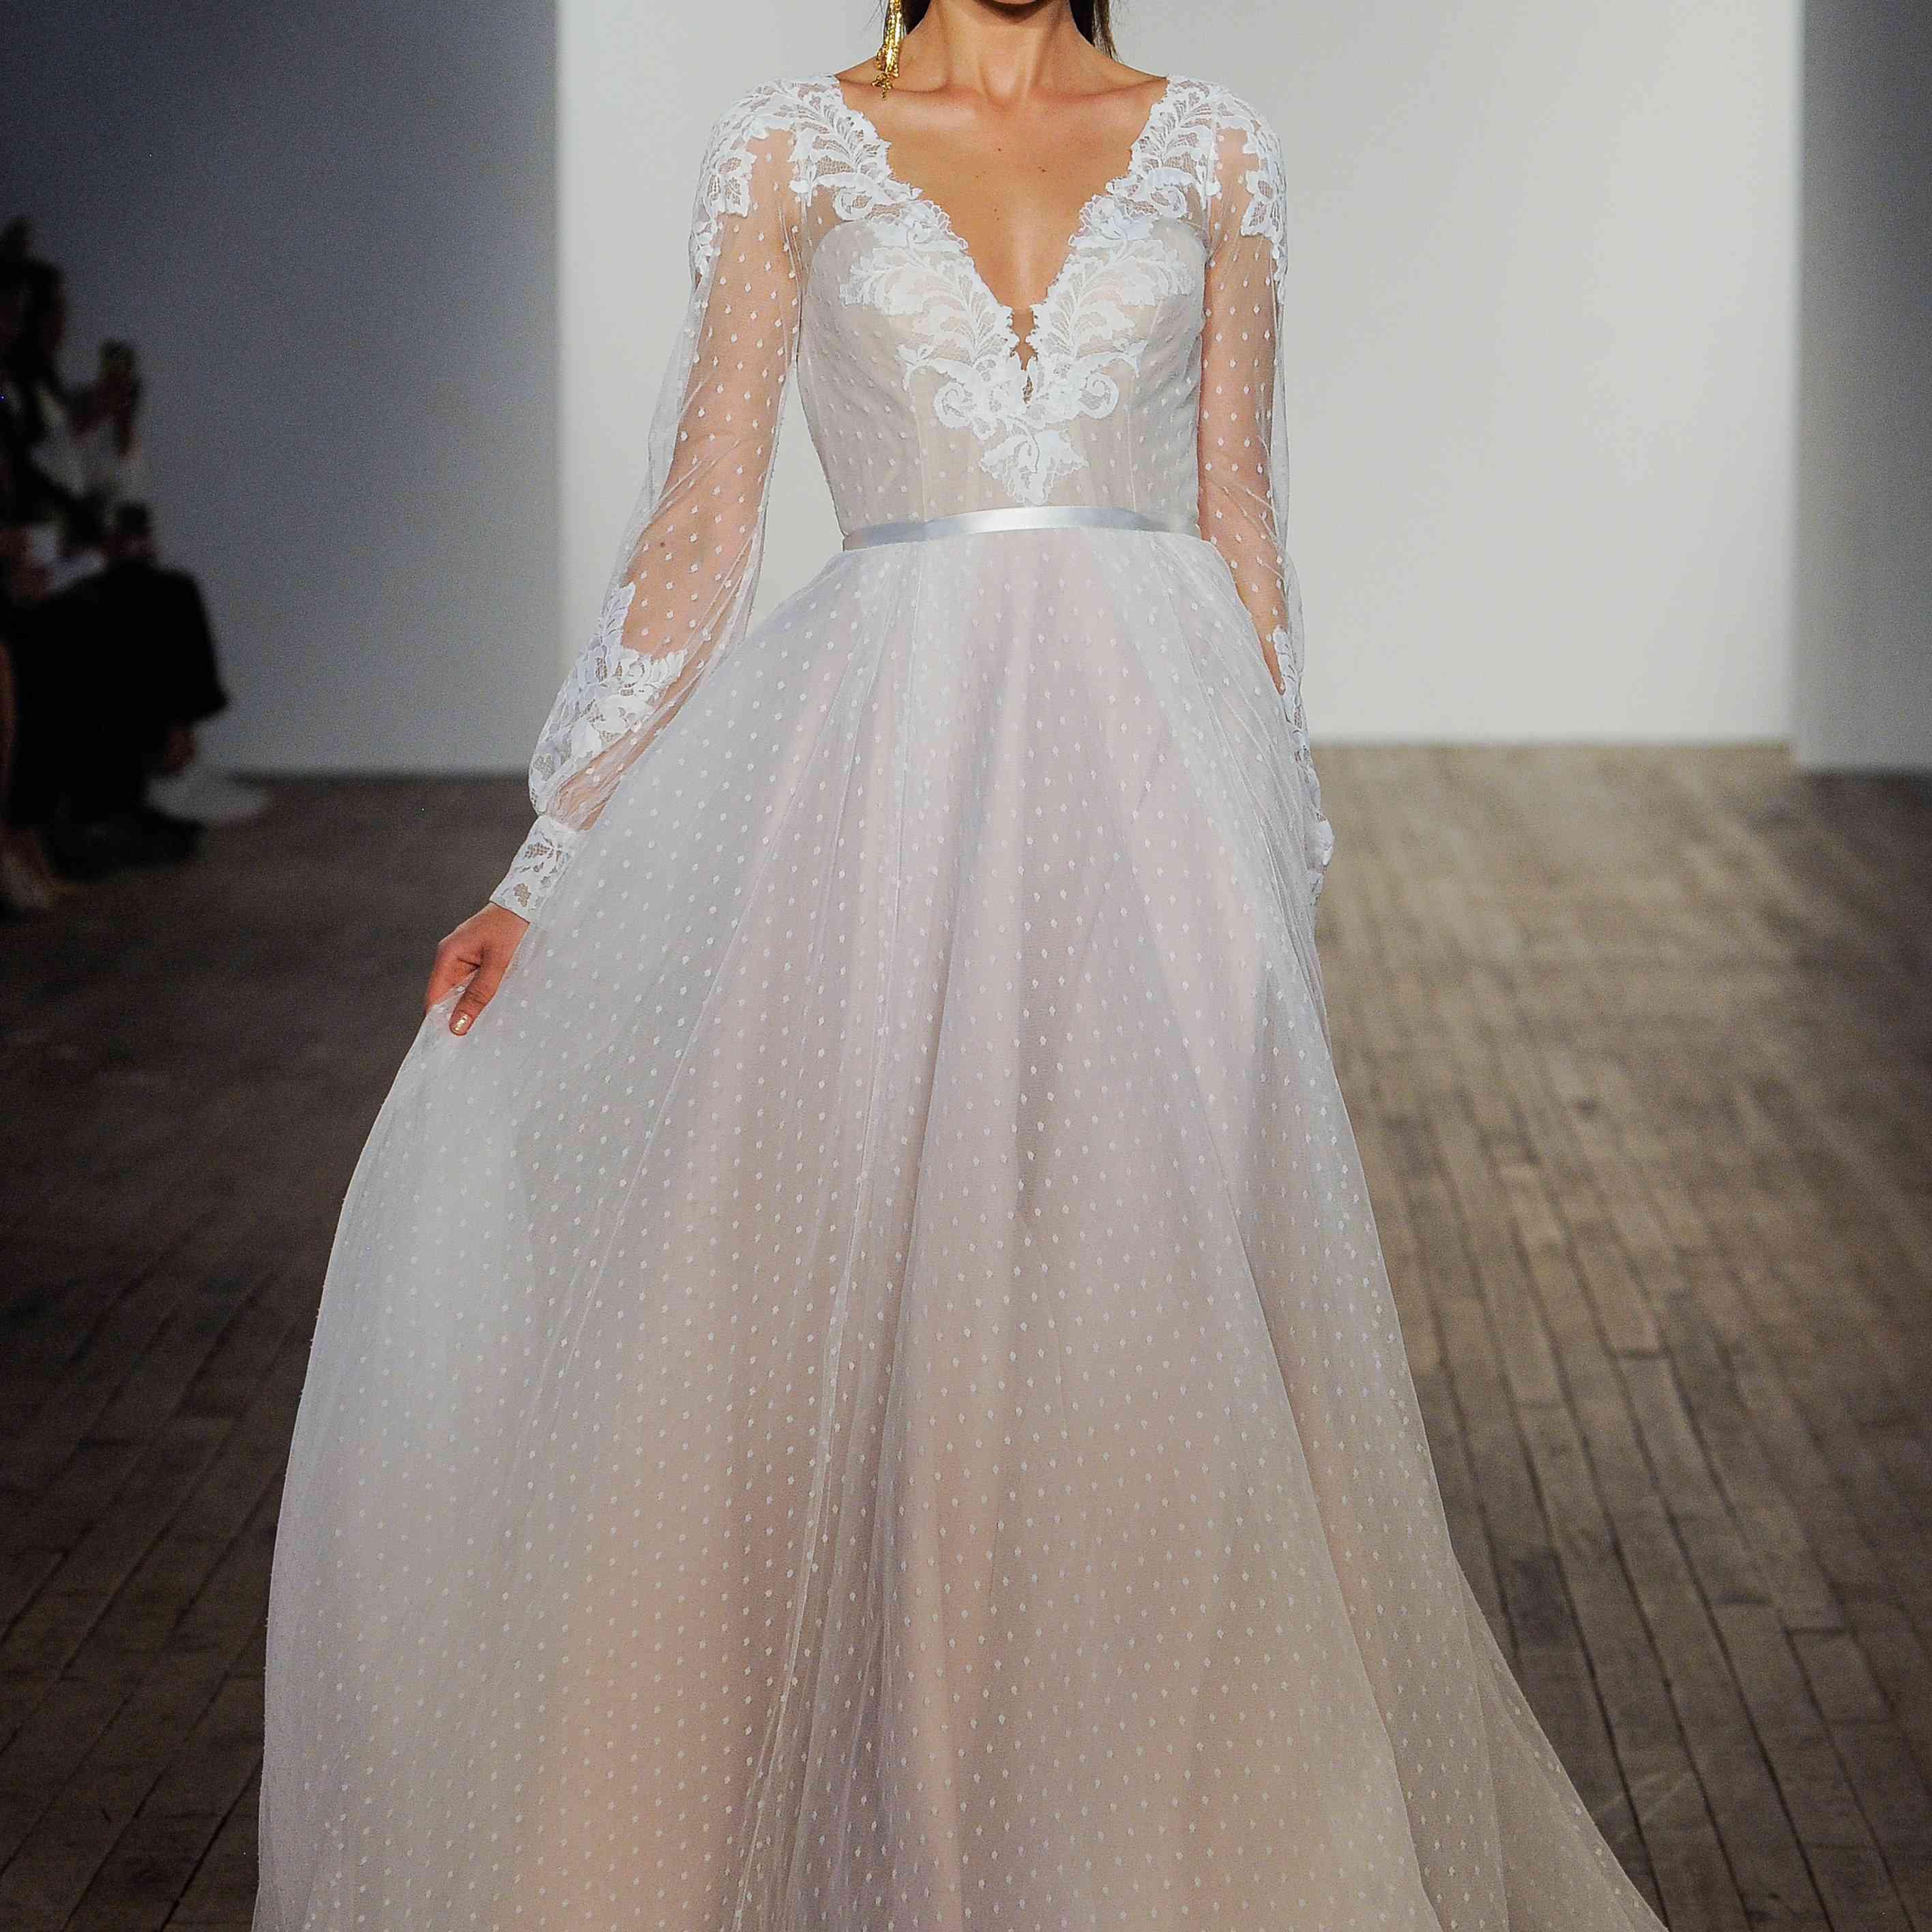 Indi long sleeve Blush by Hayley Paige Wedding Dress